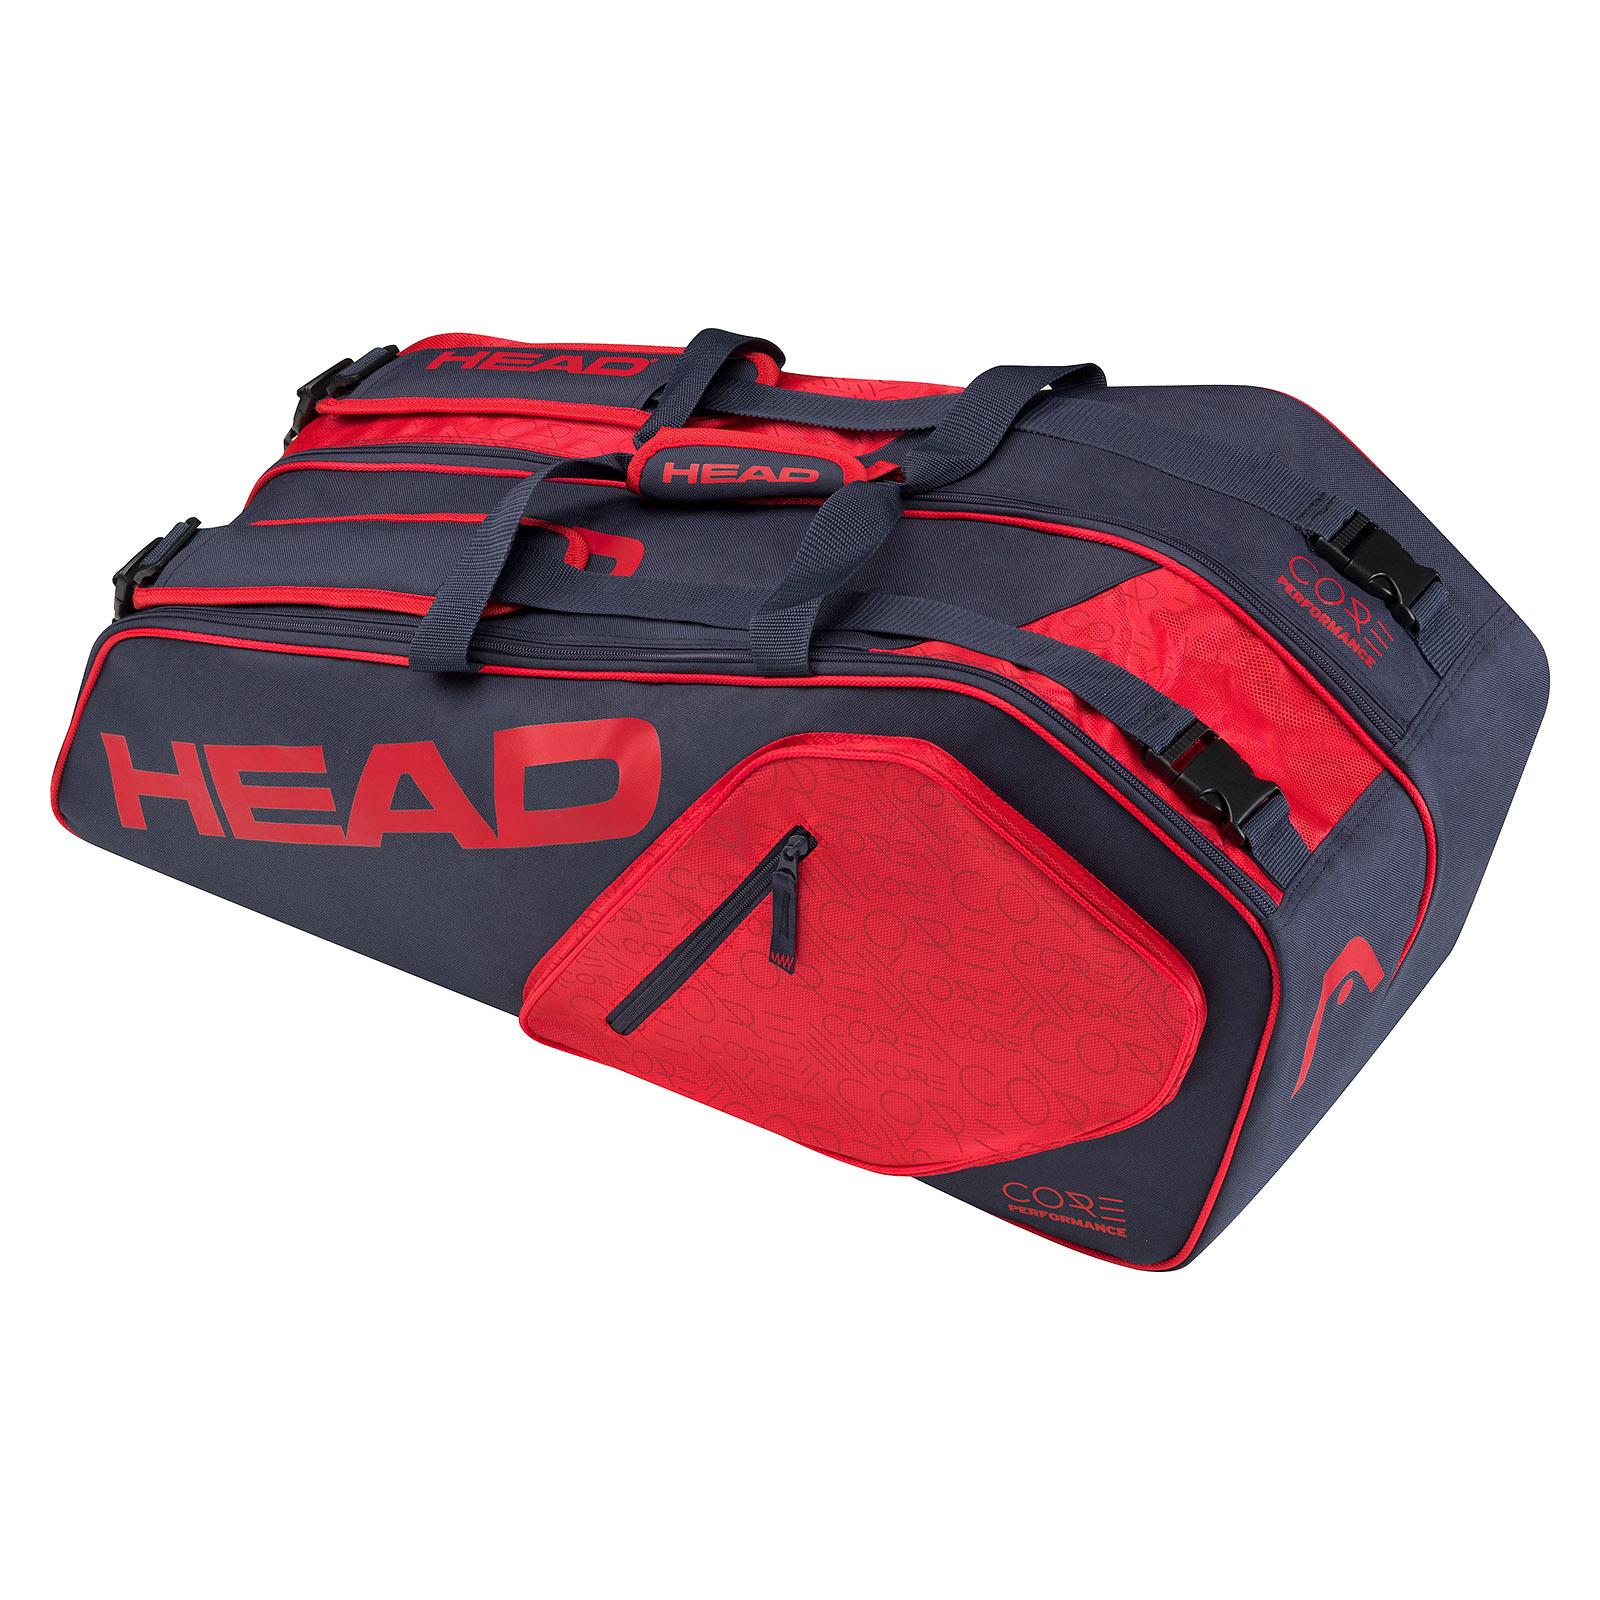 HEAD Core 6R Combi Red 2017